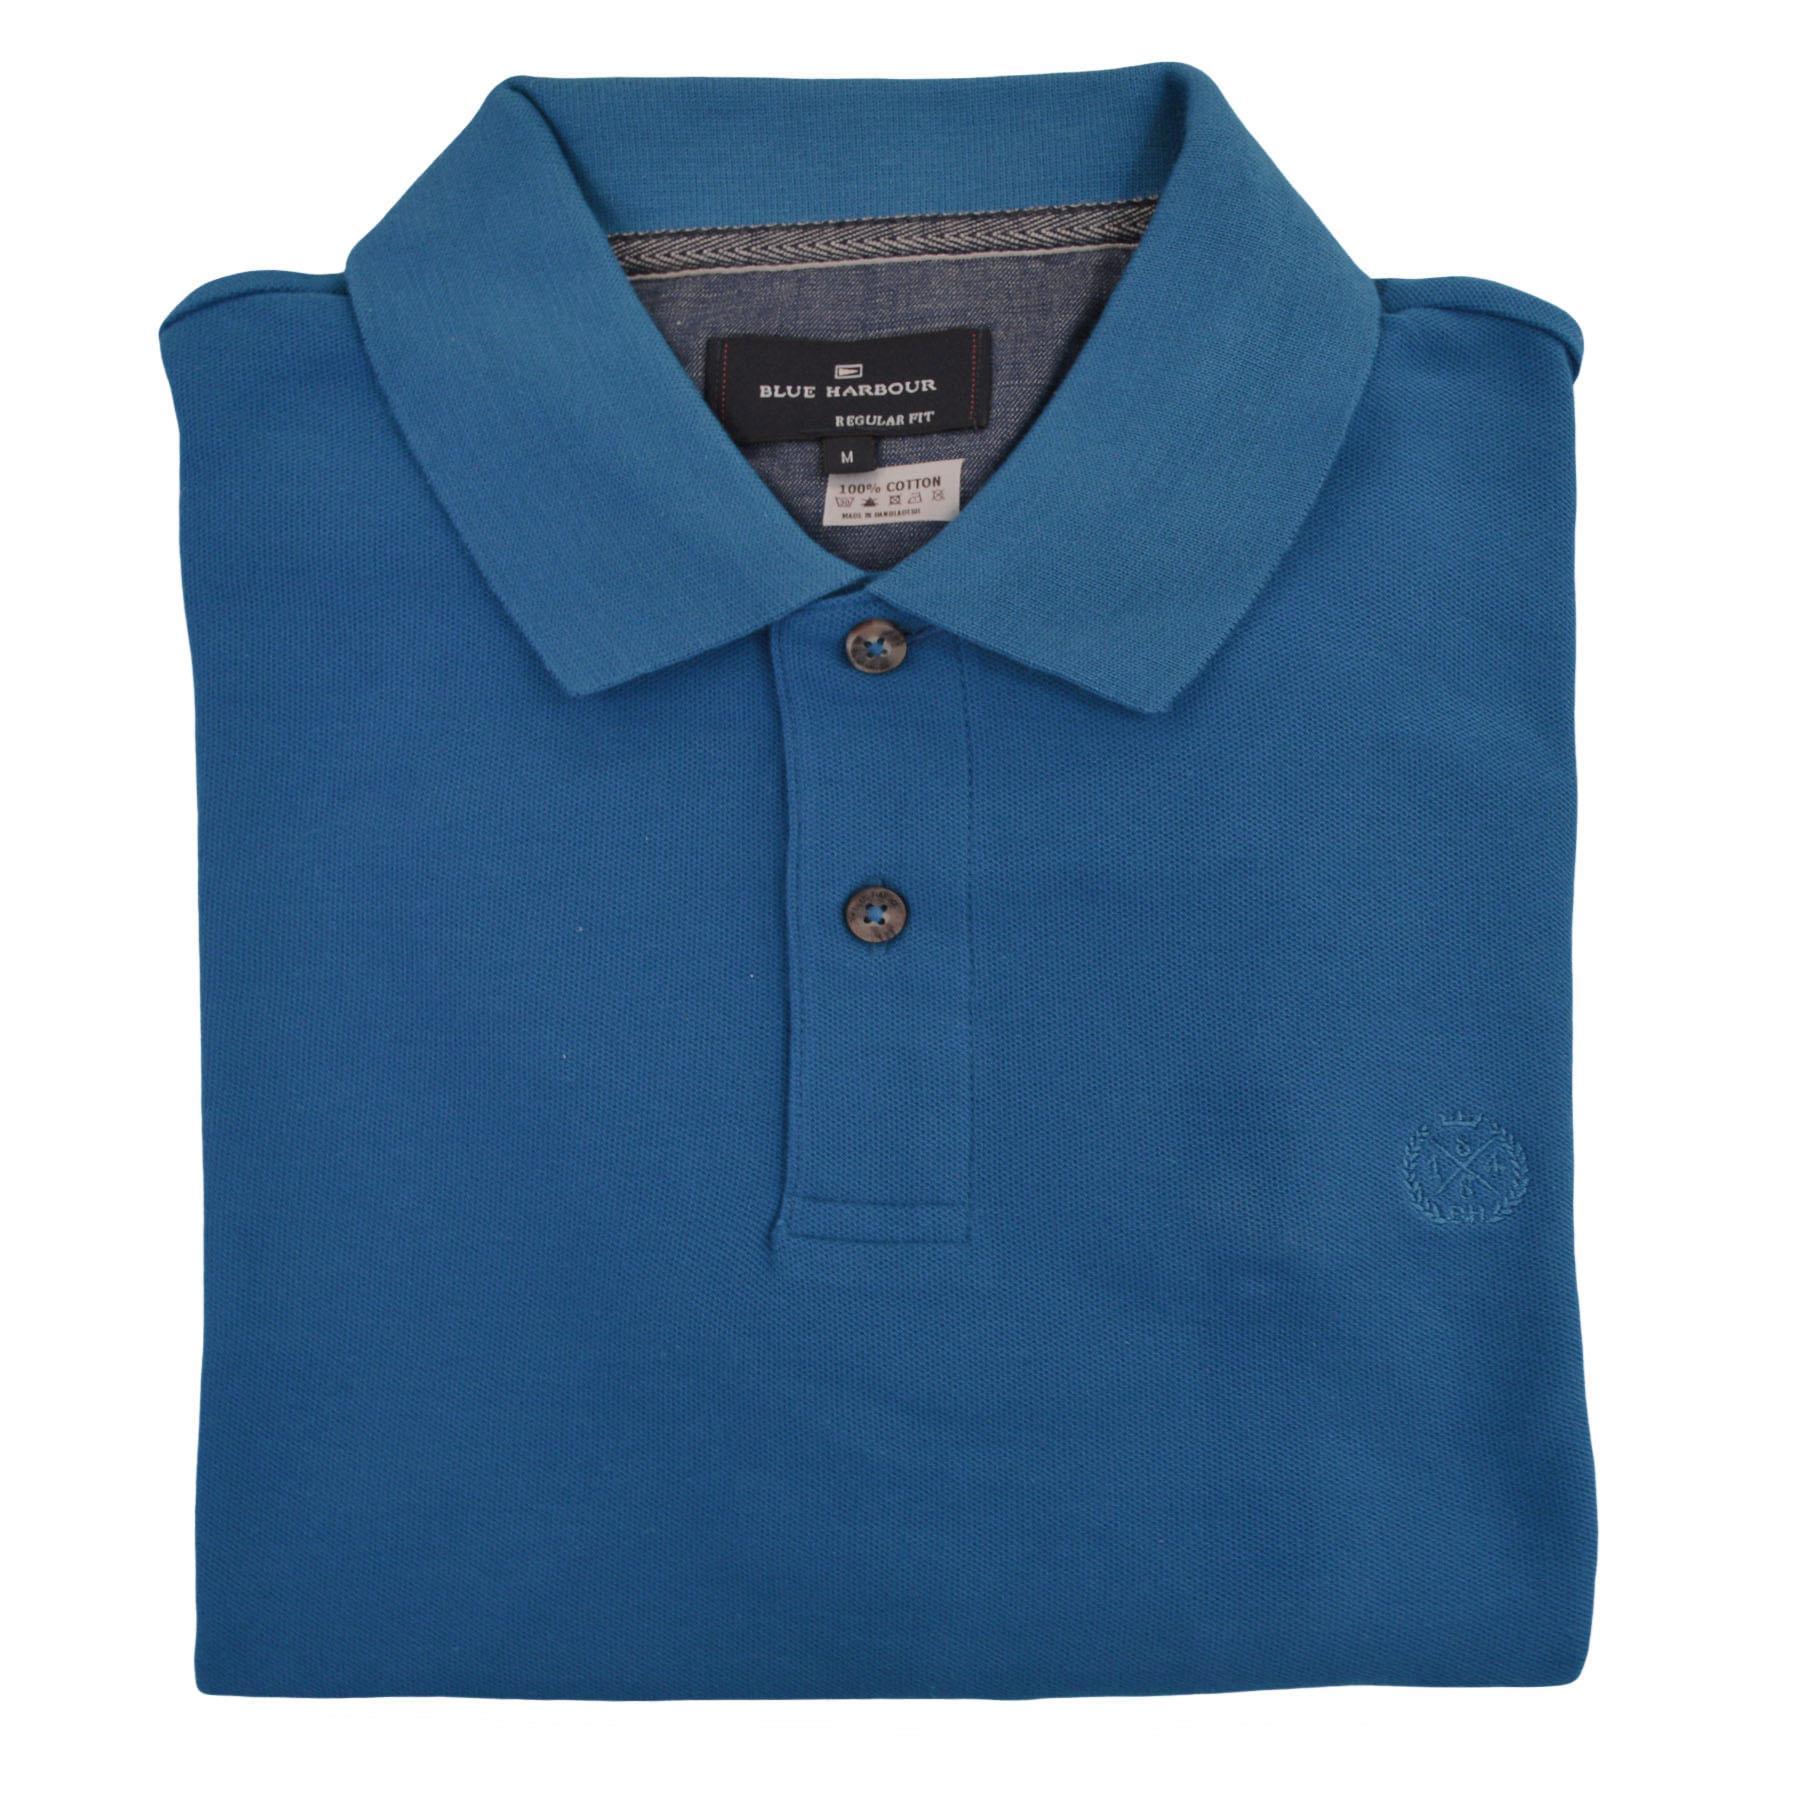 M-amp-S-BLUE-HARBOUR-Camisa-Polo-Para-Hombre-a-Rayas-Contraste-Cuello-Logotipo-Bordado miniatura 7